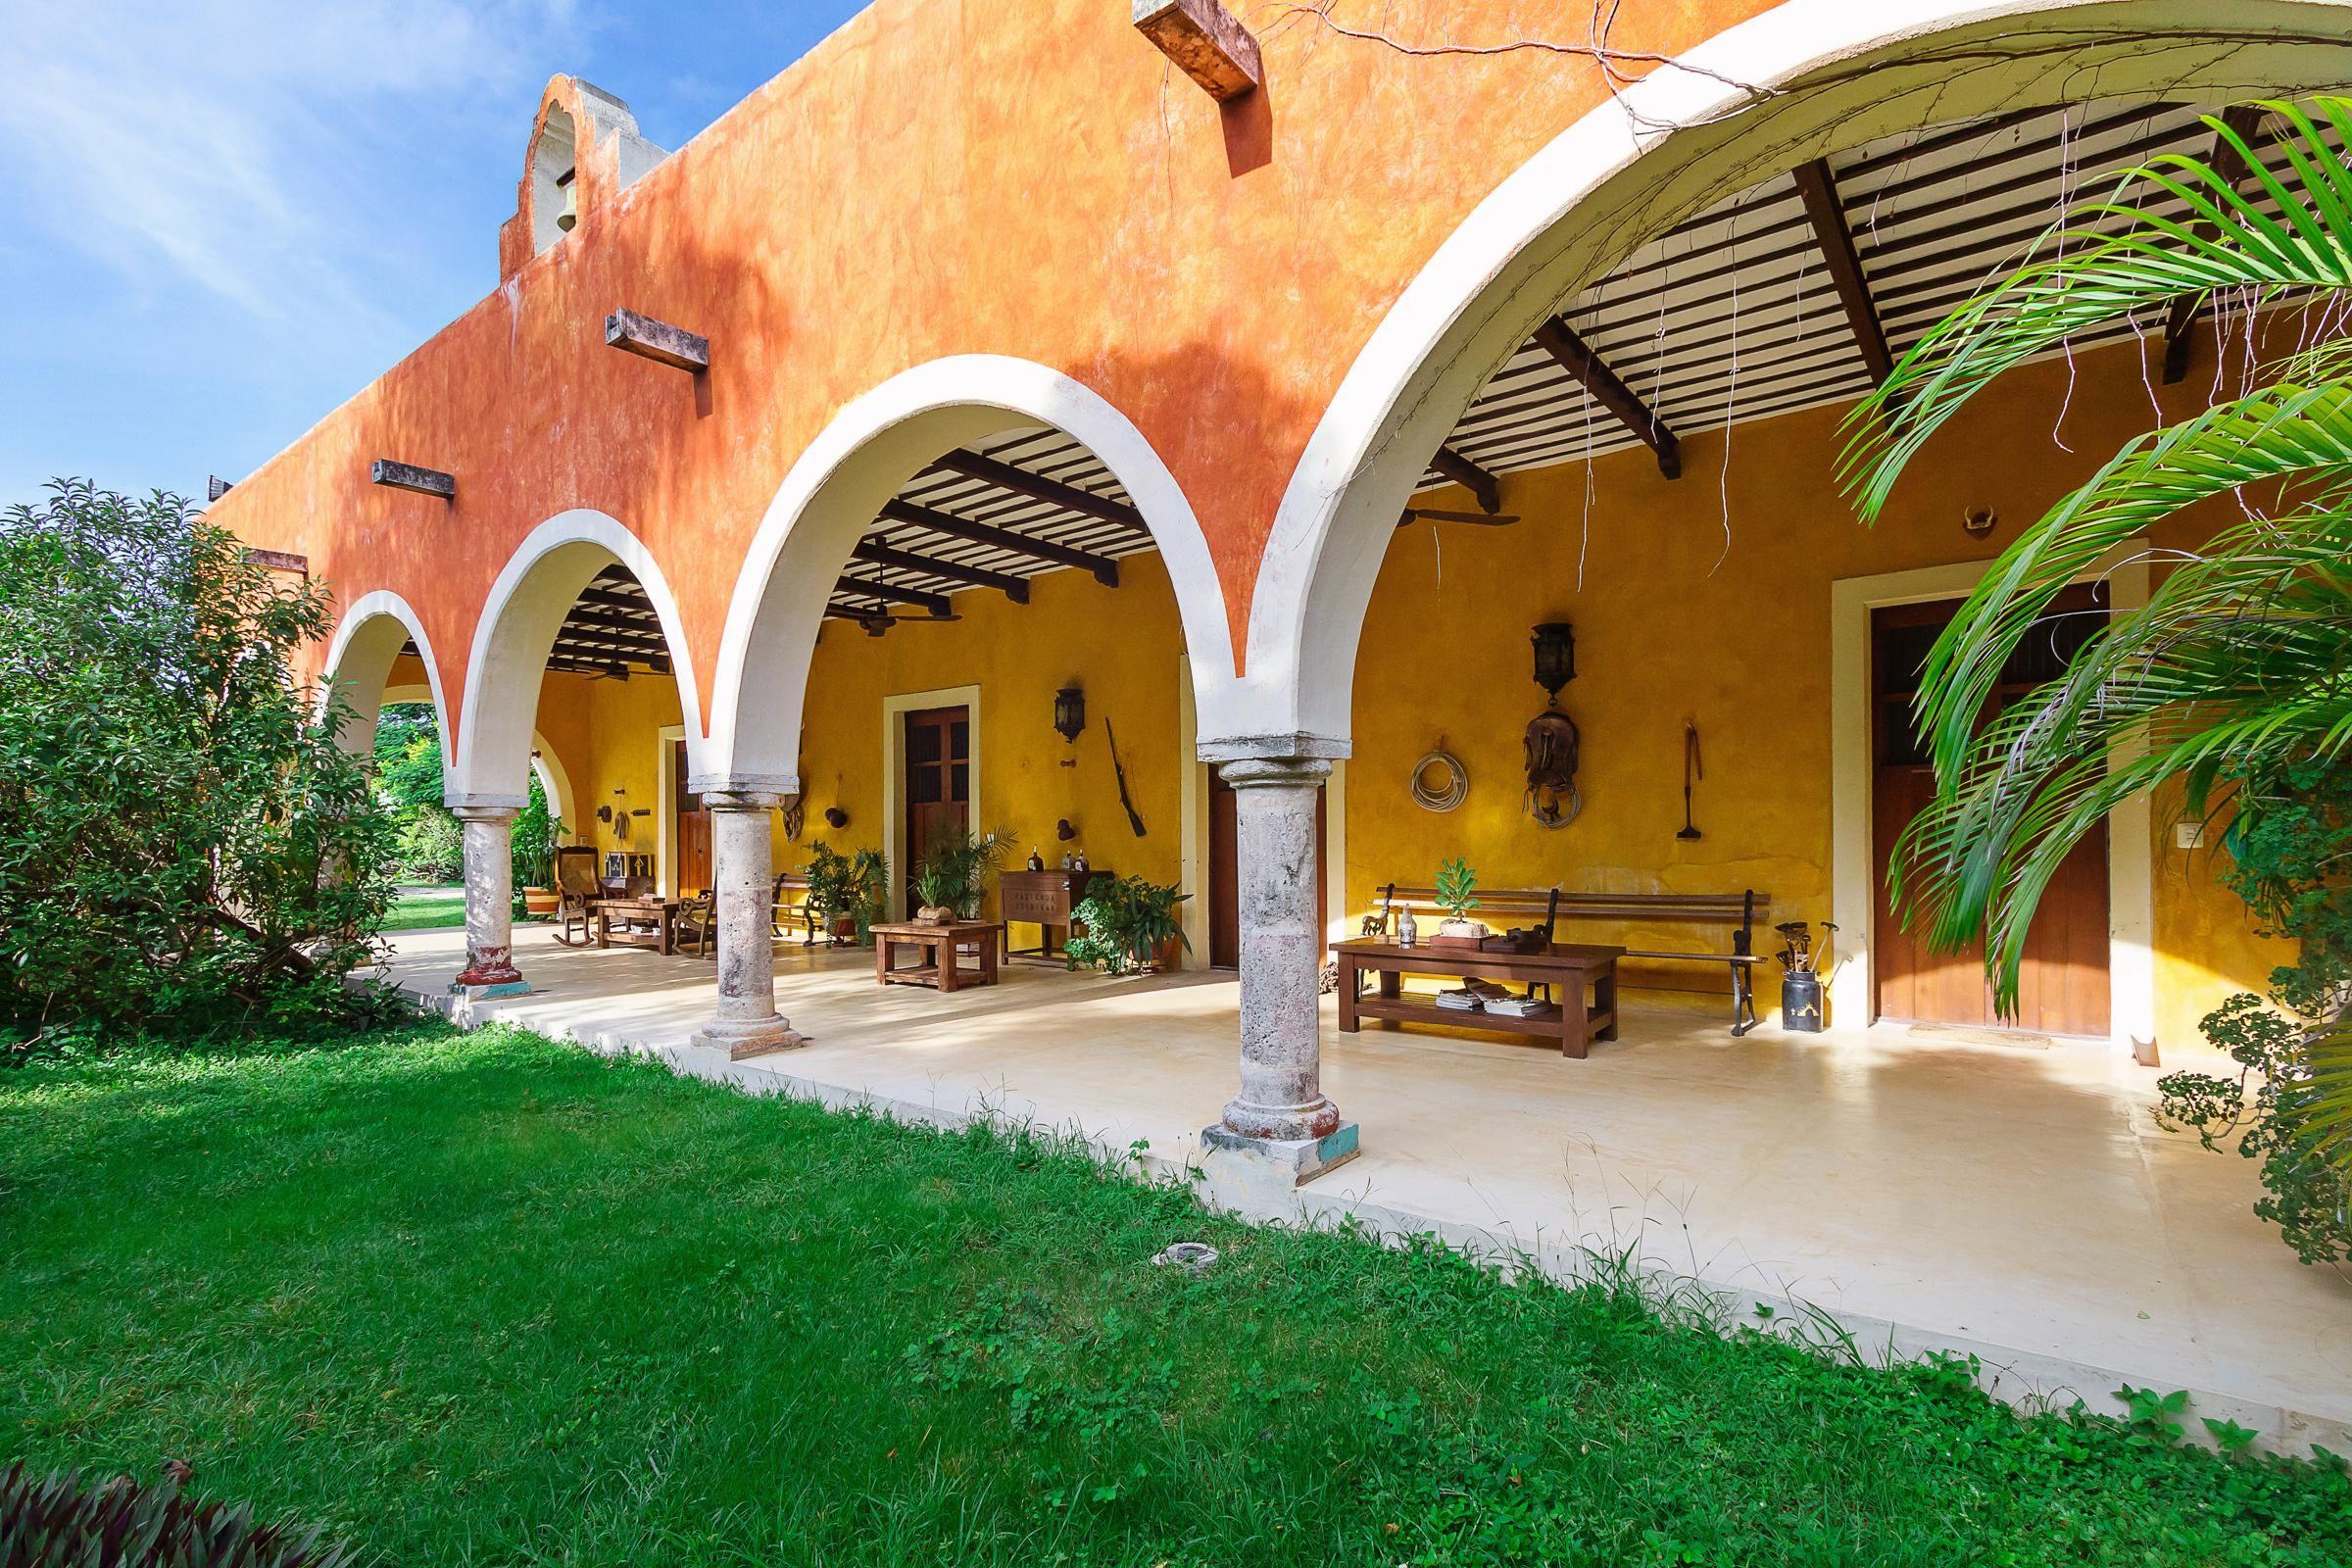 Villa Dzibikak | Find Vacation Rental Homes In Merida And The Yucatan  Coast, México On